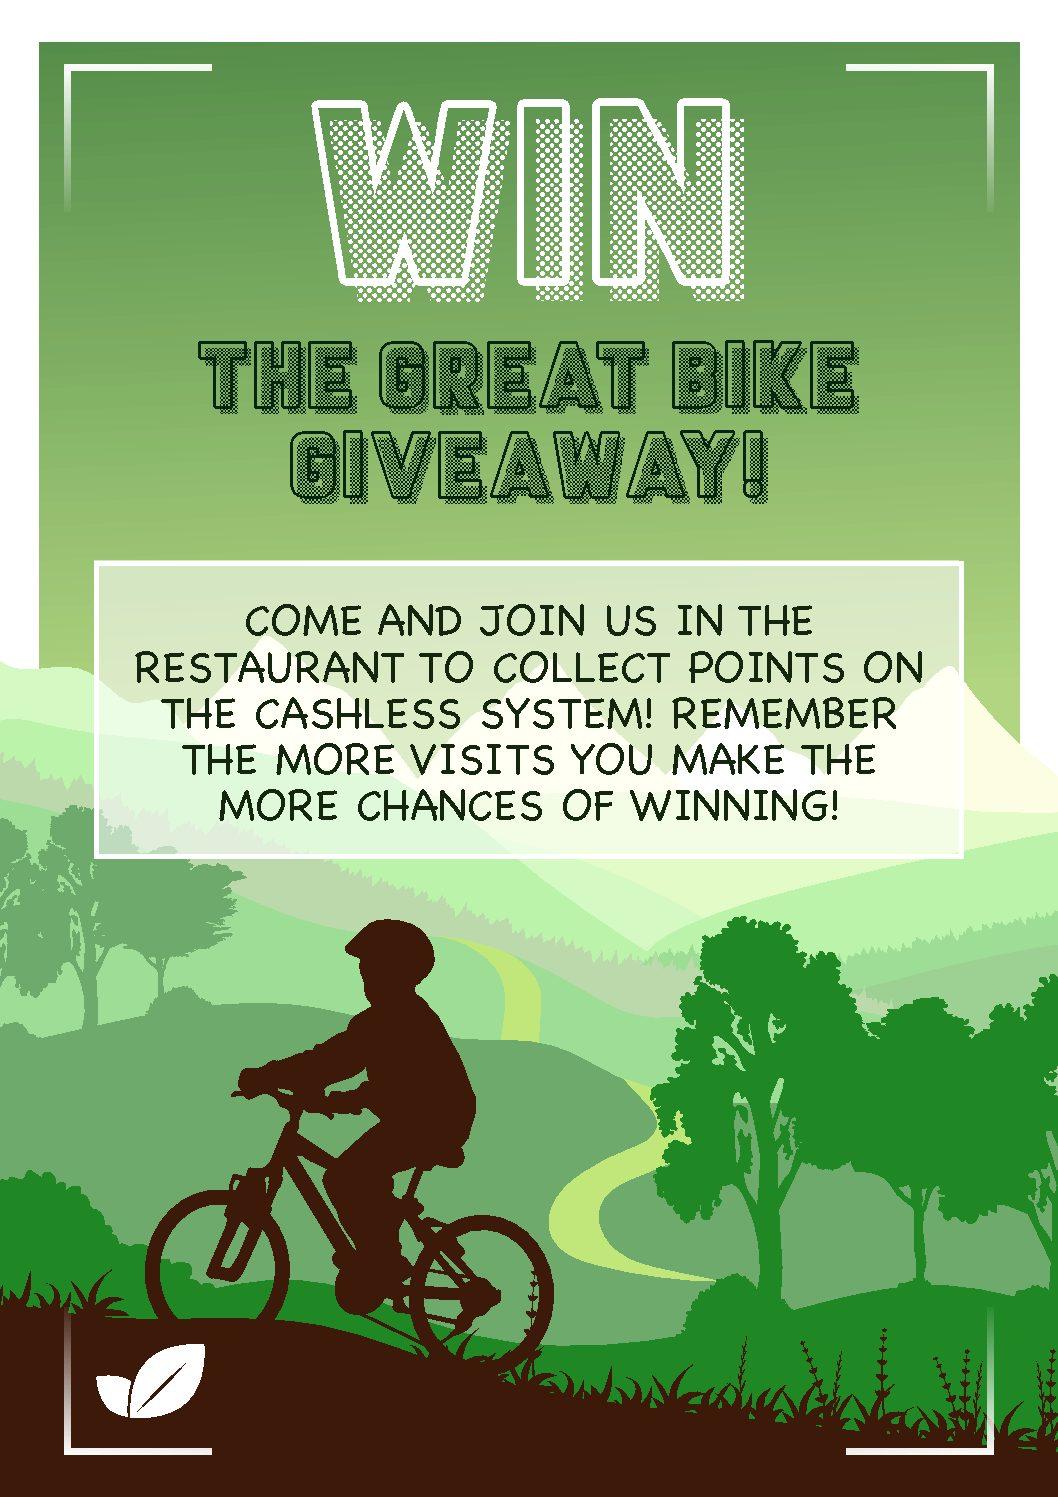 Great Bike Giveaway!